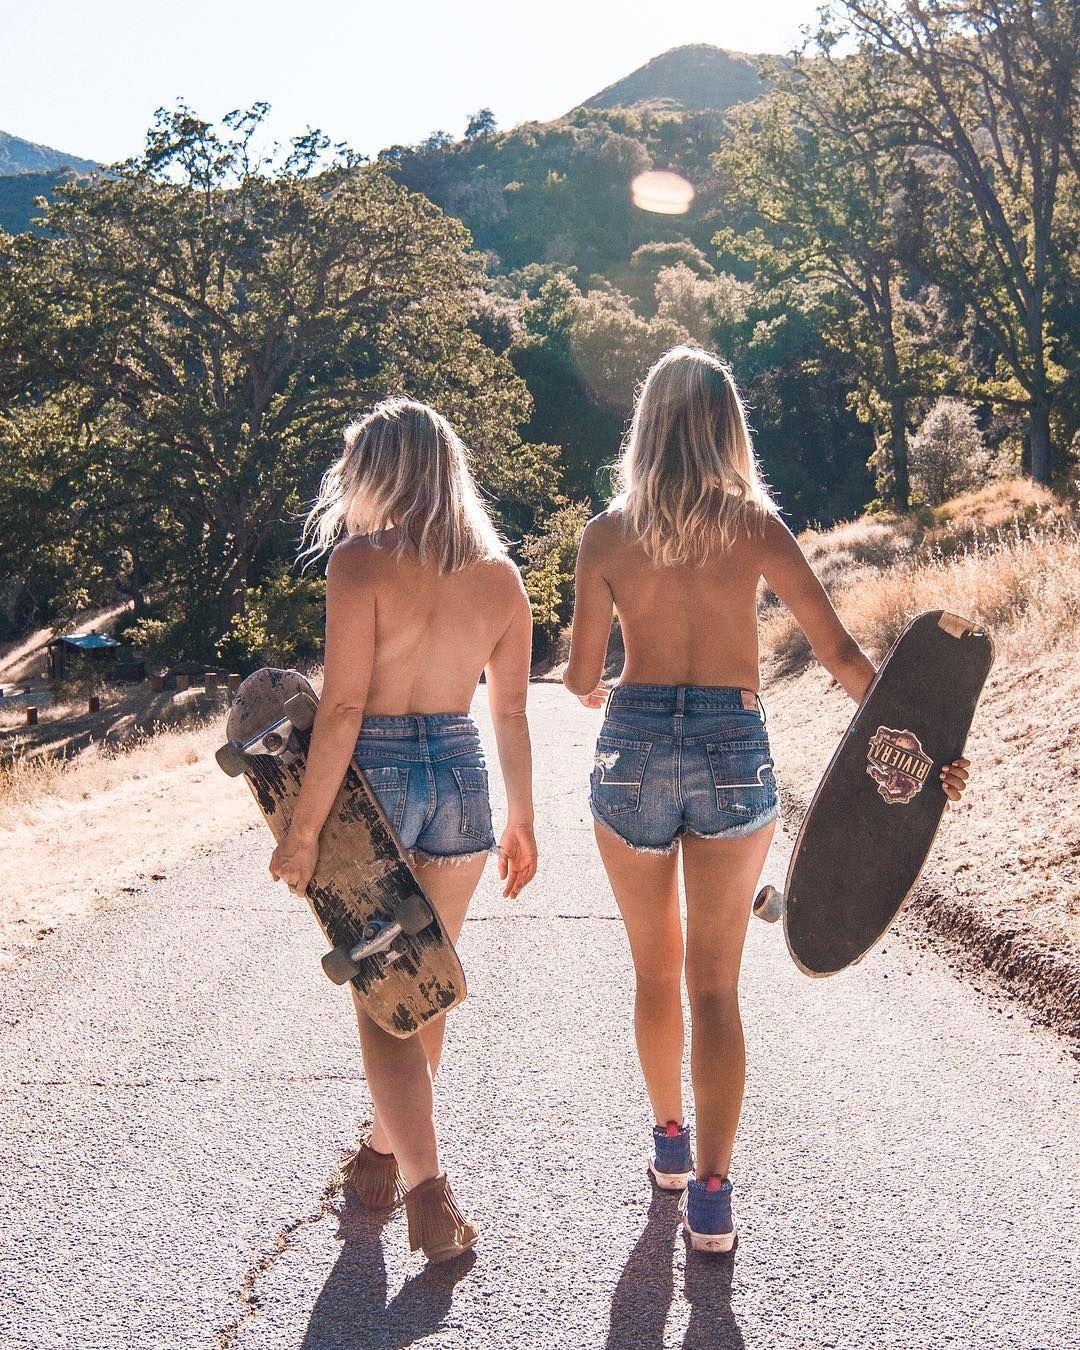 hippy chicks naked